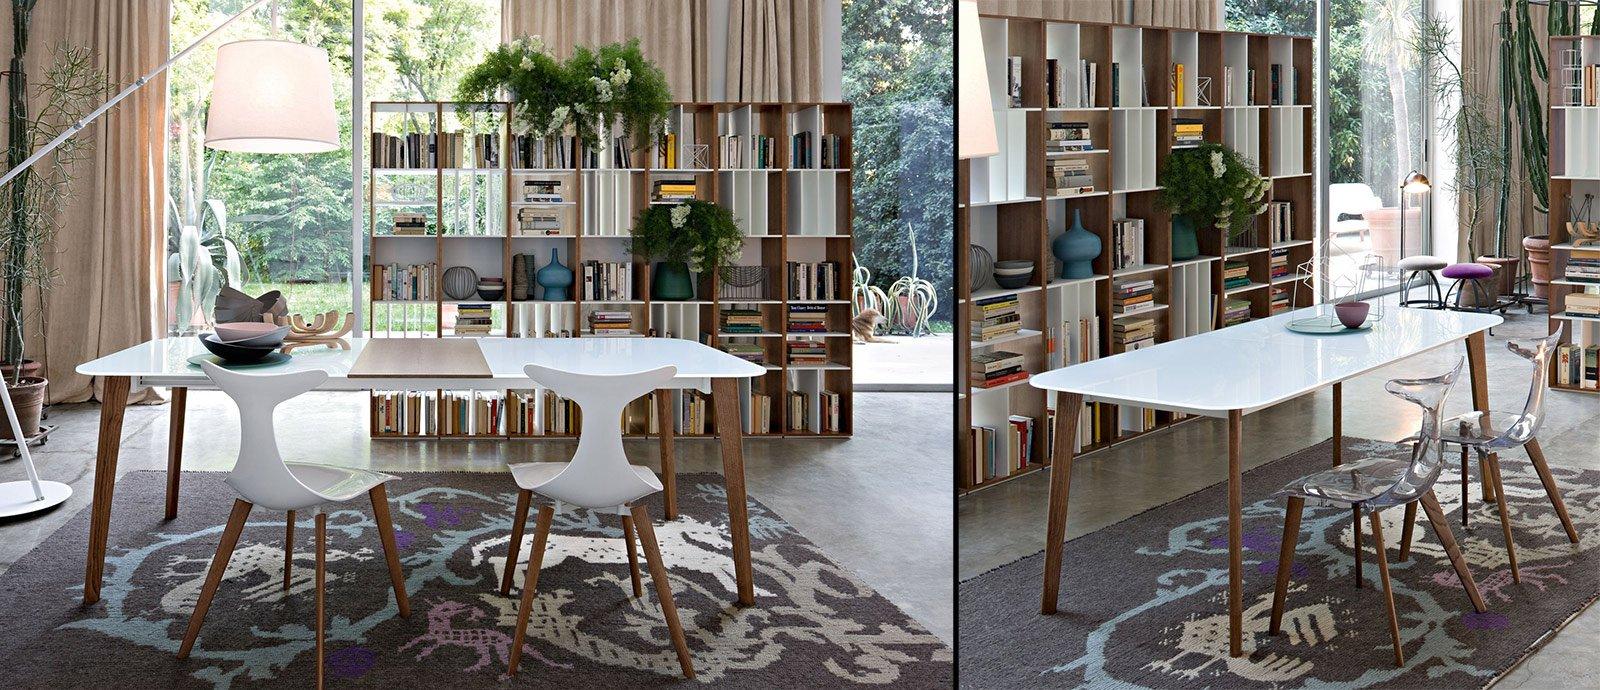 tavoli allungabili - cose di casa - Maison Du Monde Tavoli Allungabili